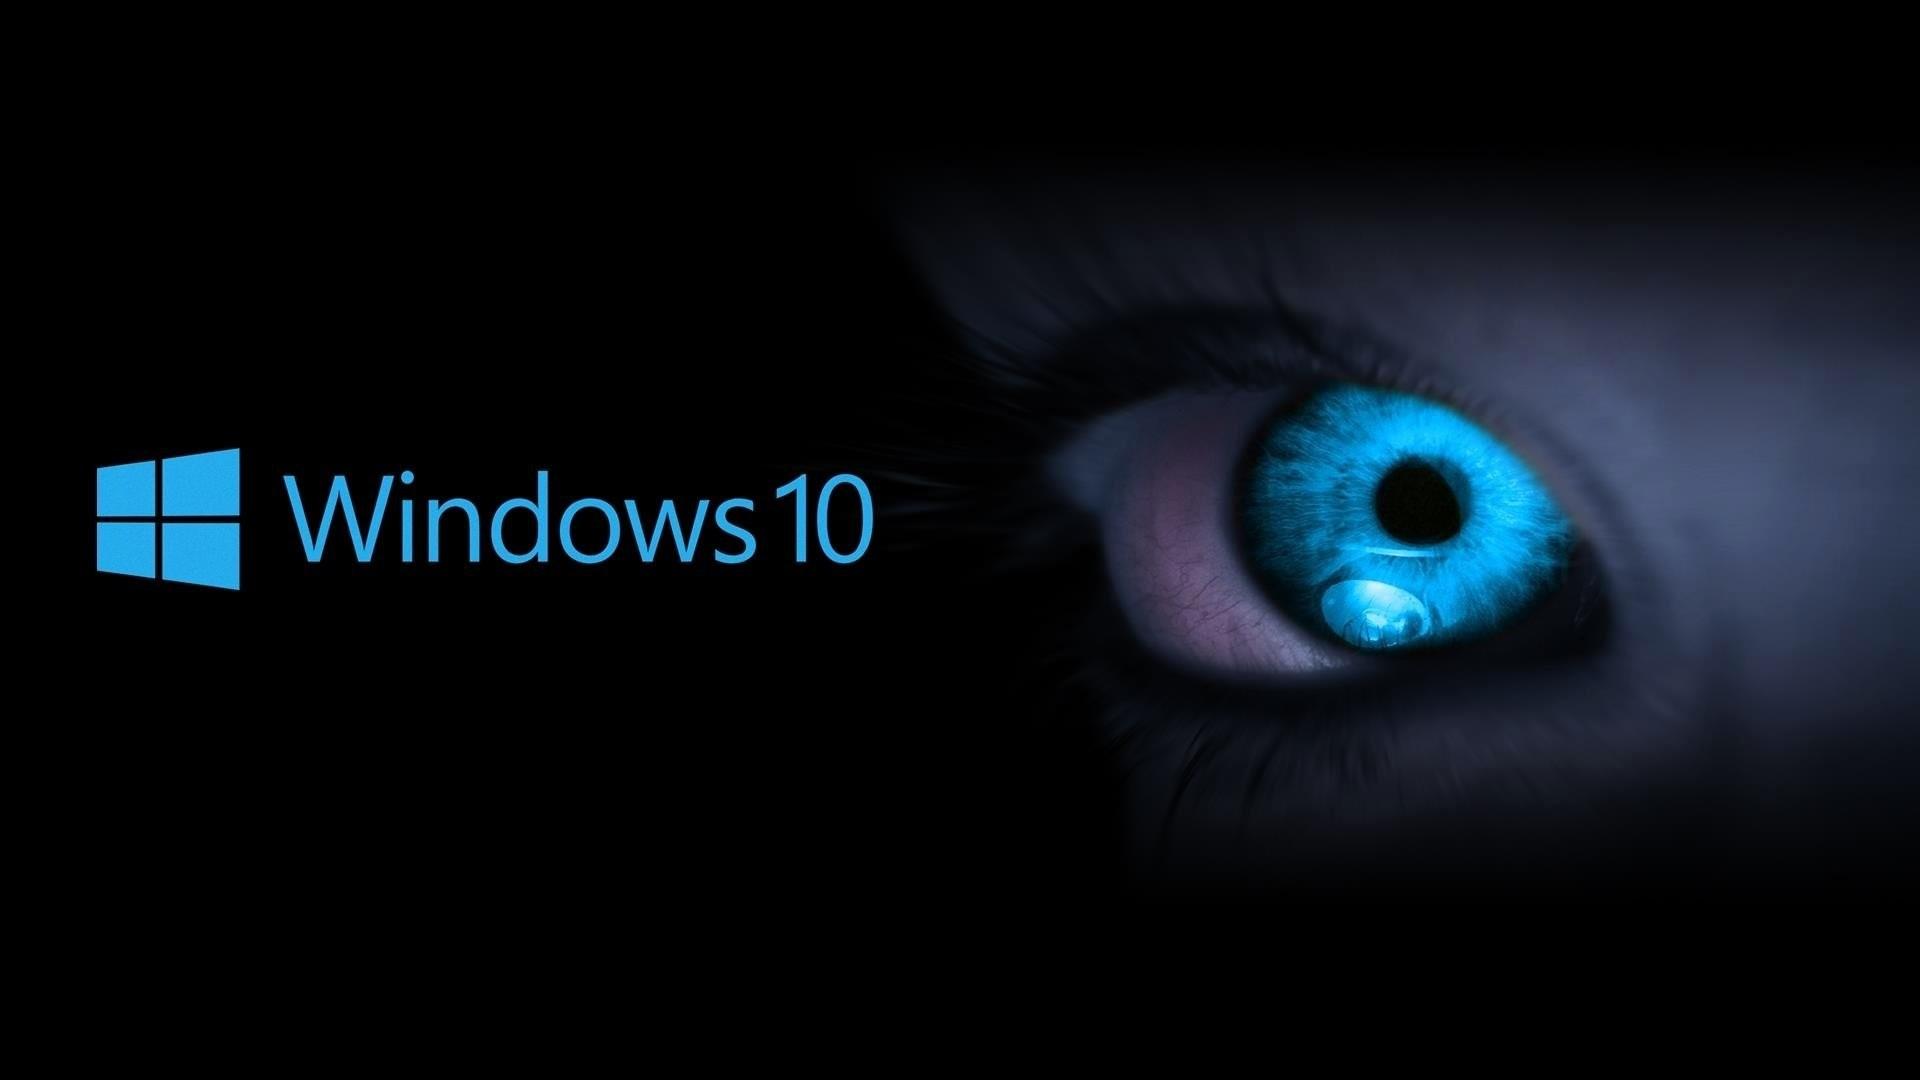 Windows 10 Wallpaper 1280x1024 79 Images